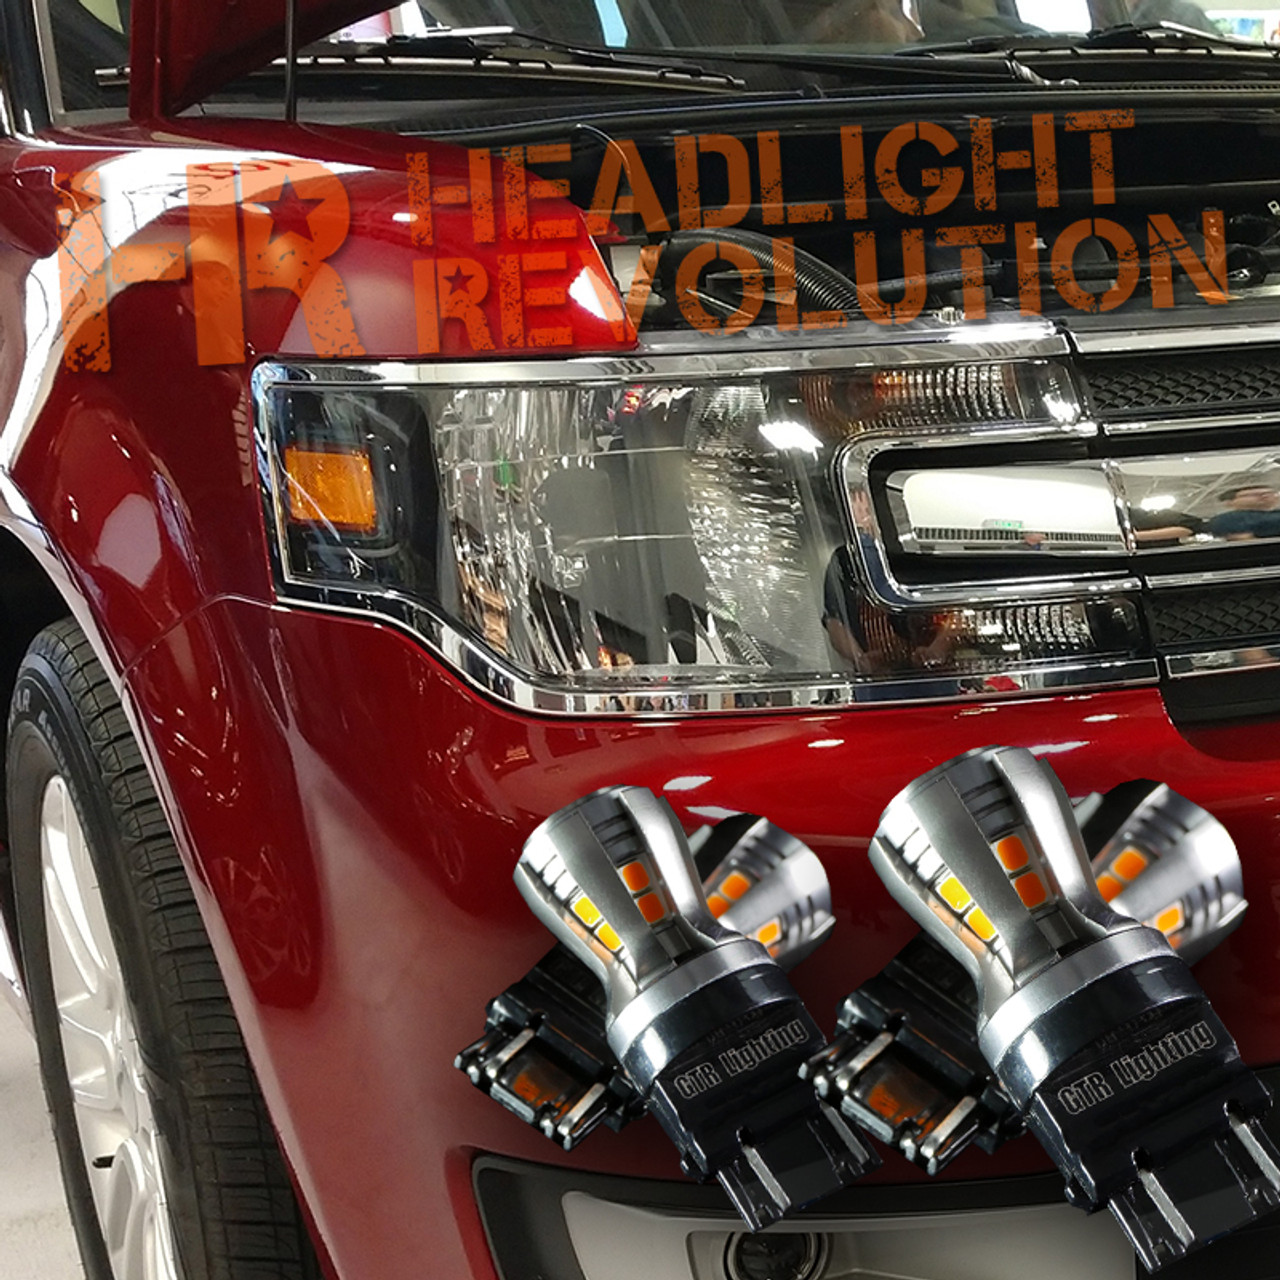 Ford Flex Sale: 2018 Ford Flex Front Turn Signal's LED Upgrade Kit